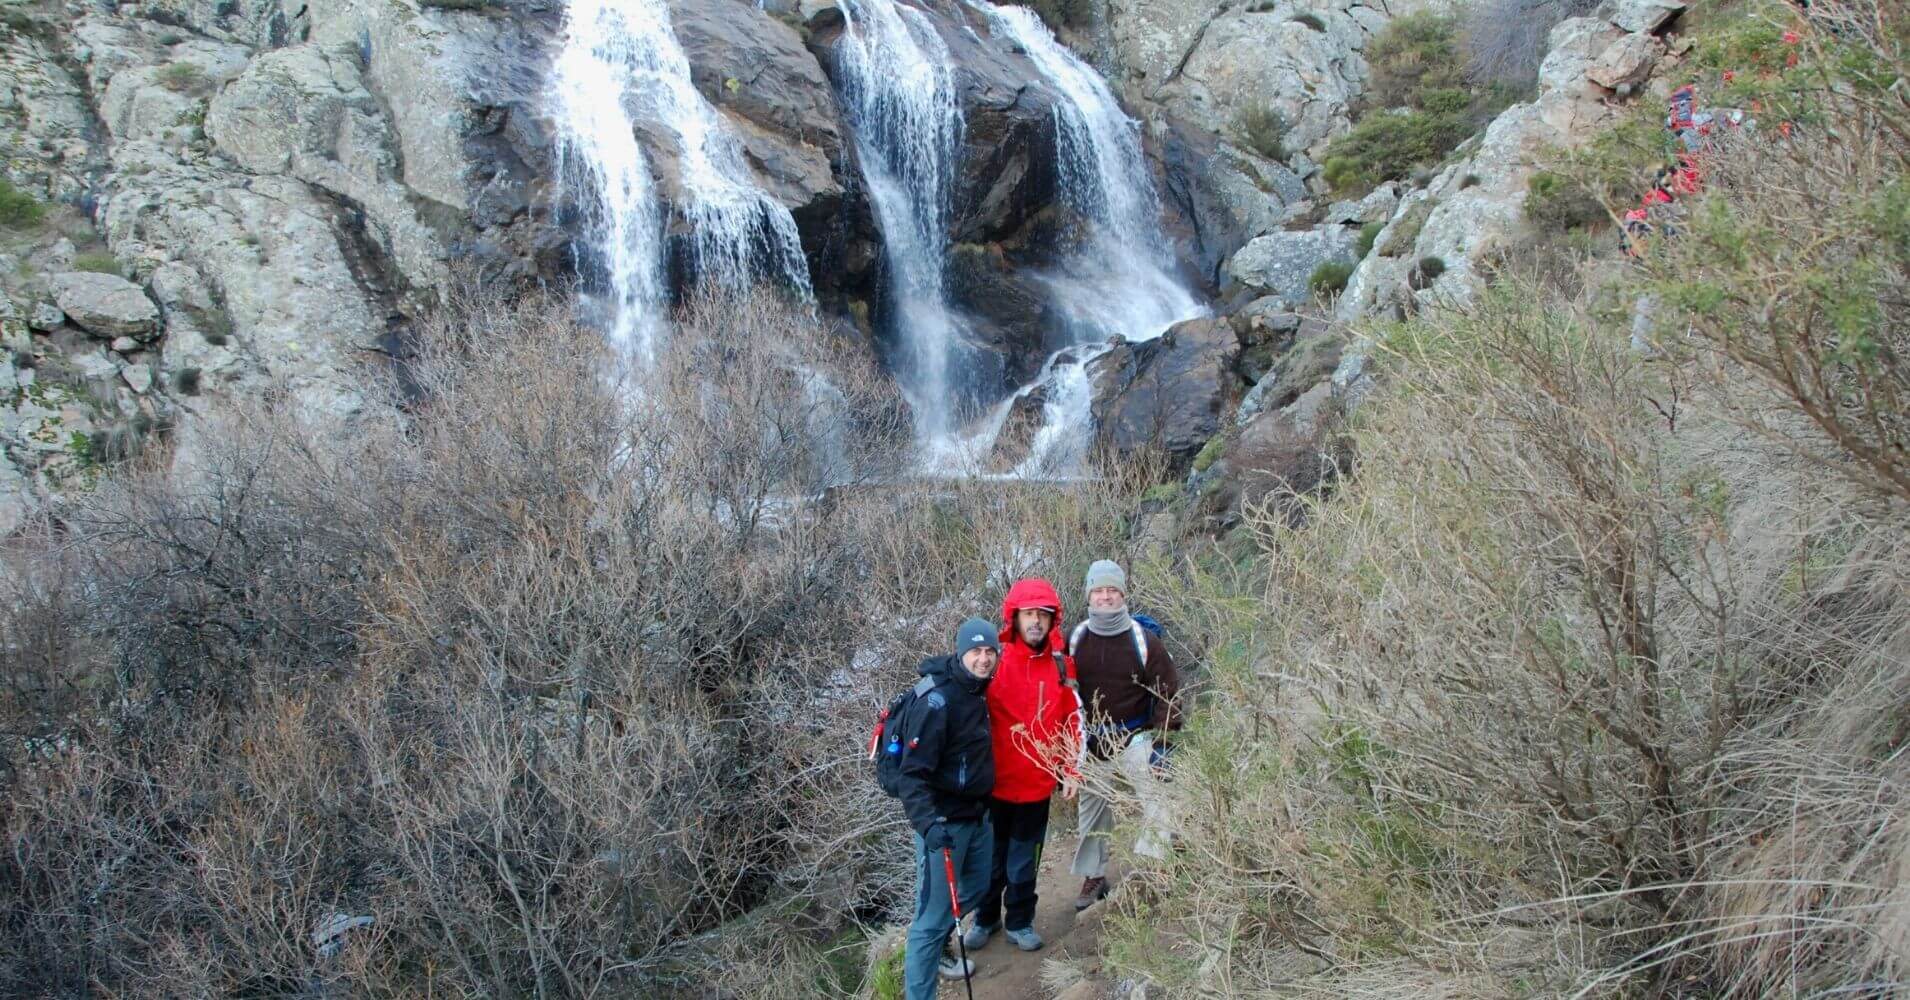 Cascada de Somosierra. Madrid.